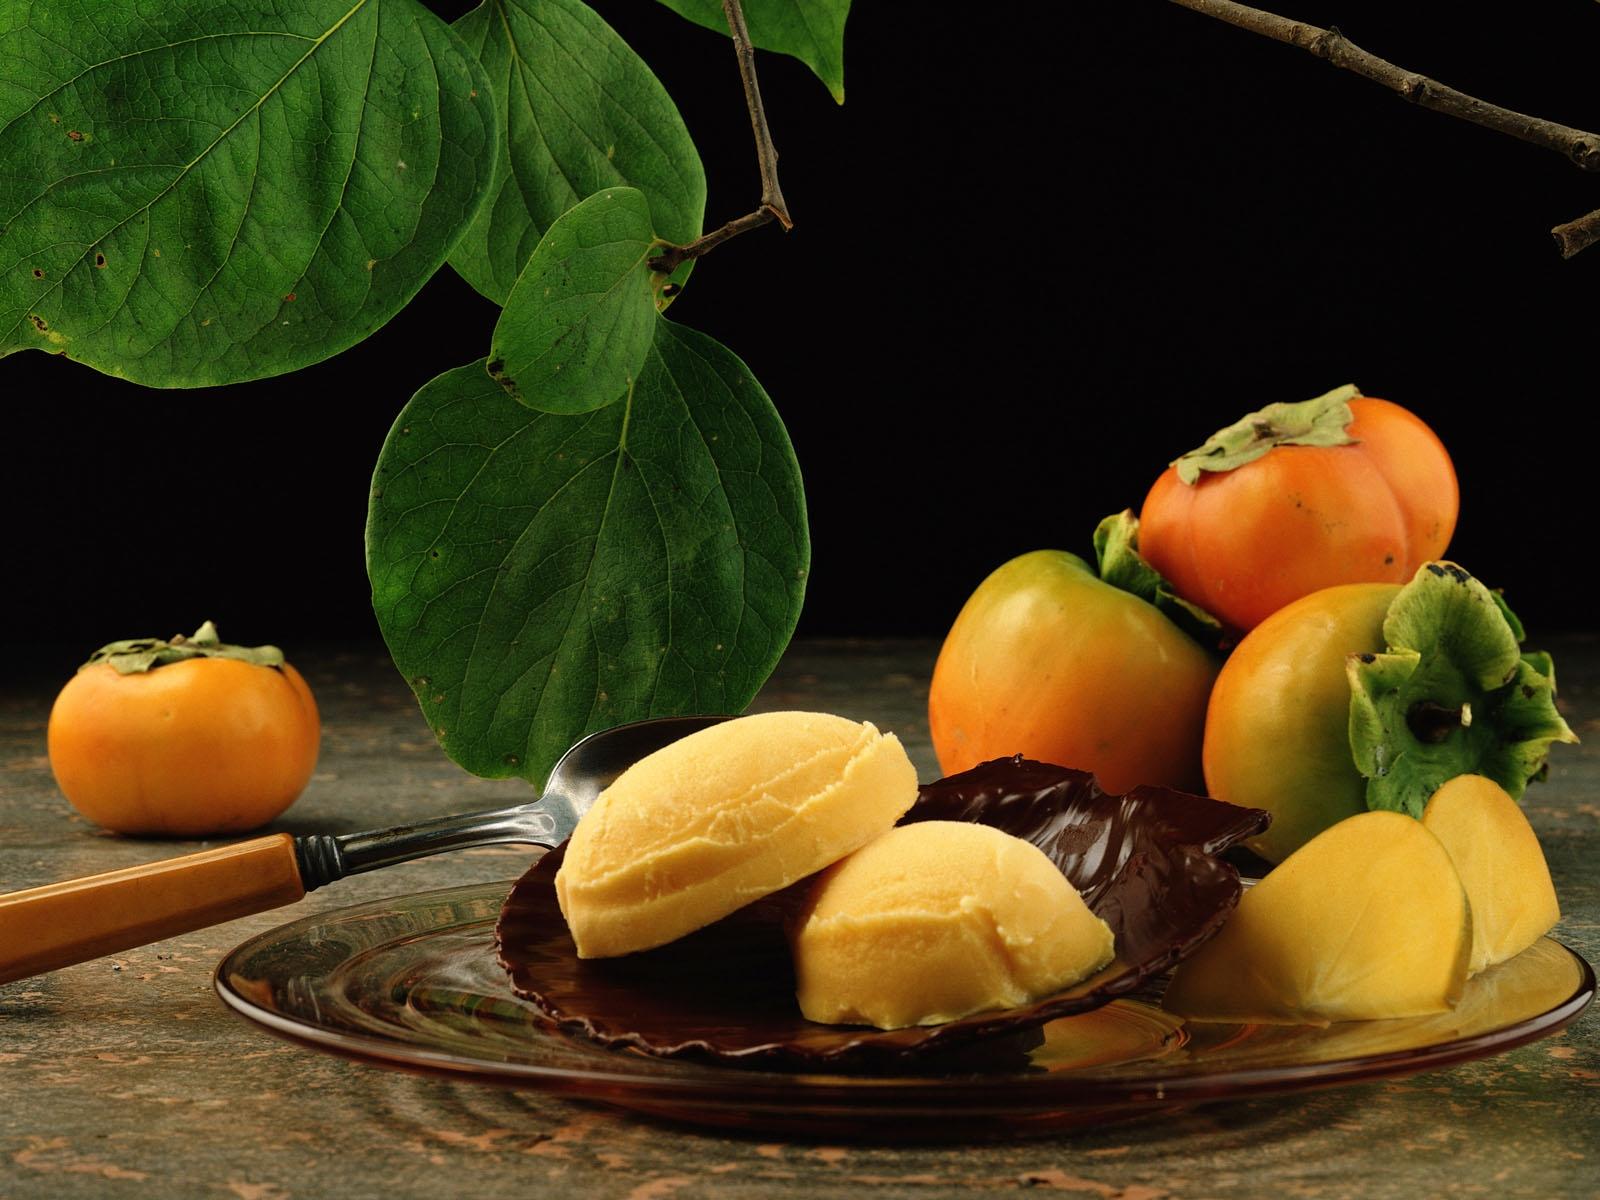 Hintergrundbilder : Malerei, Lebensmittel, Frucht, Mandarine, Teller ...